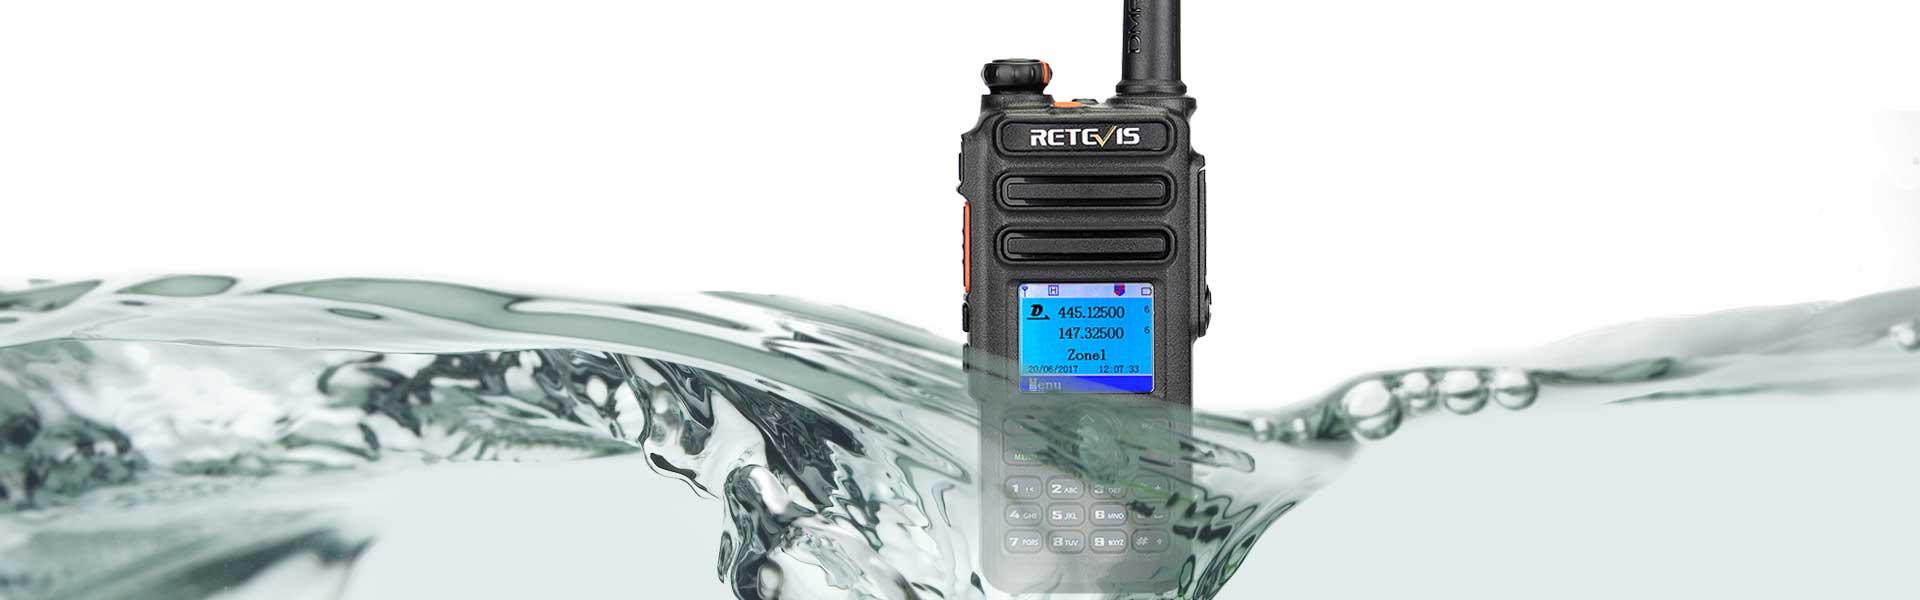 Retevis RT82 Dual band DMR Digital Radio